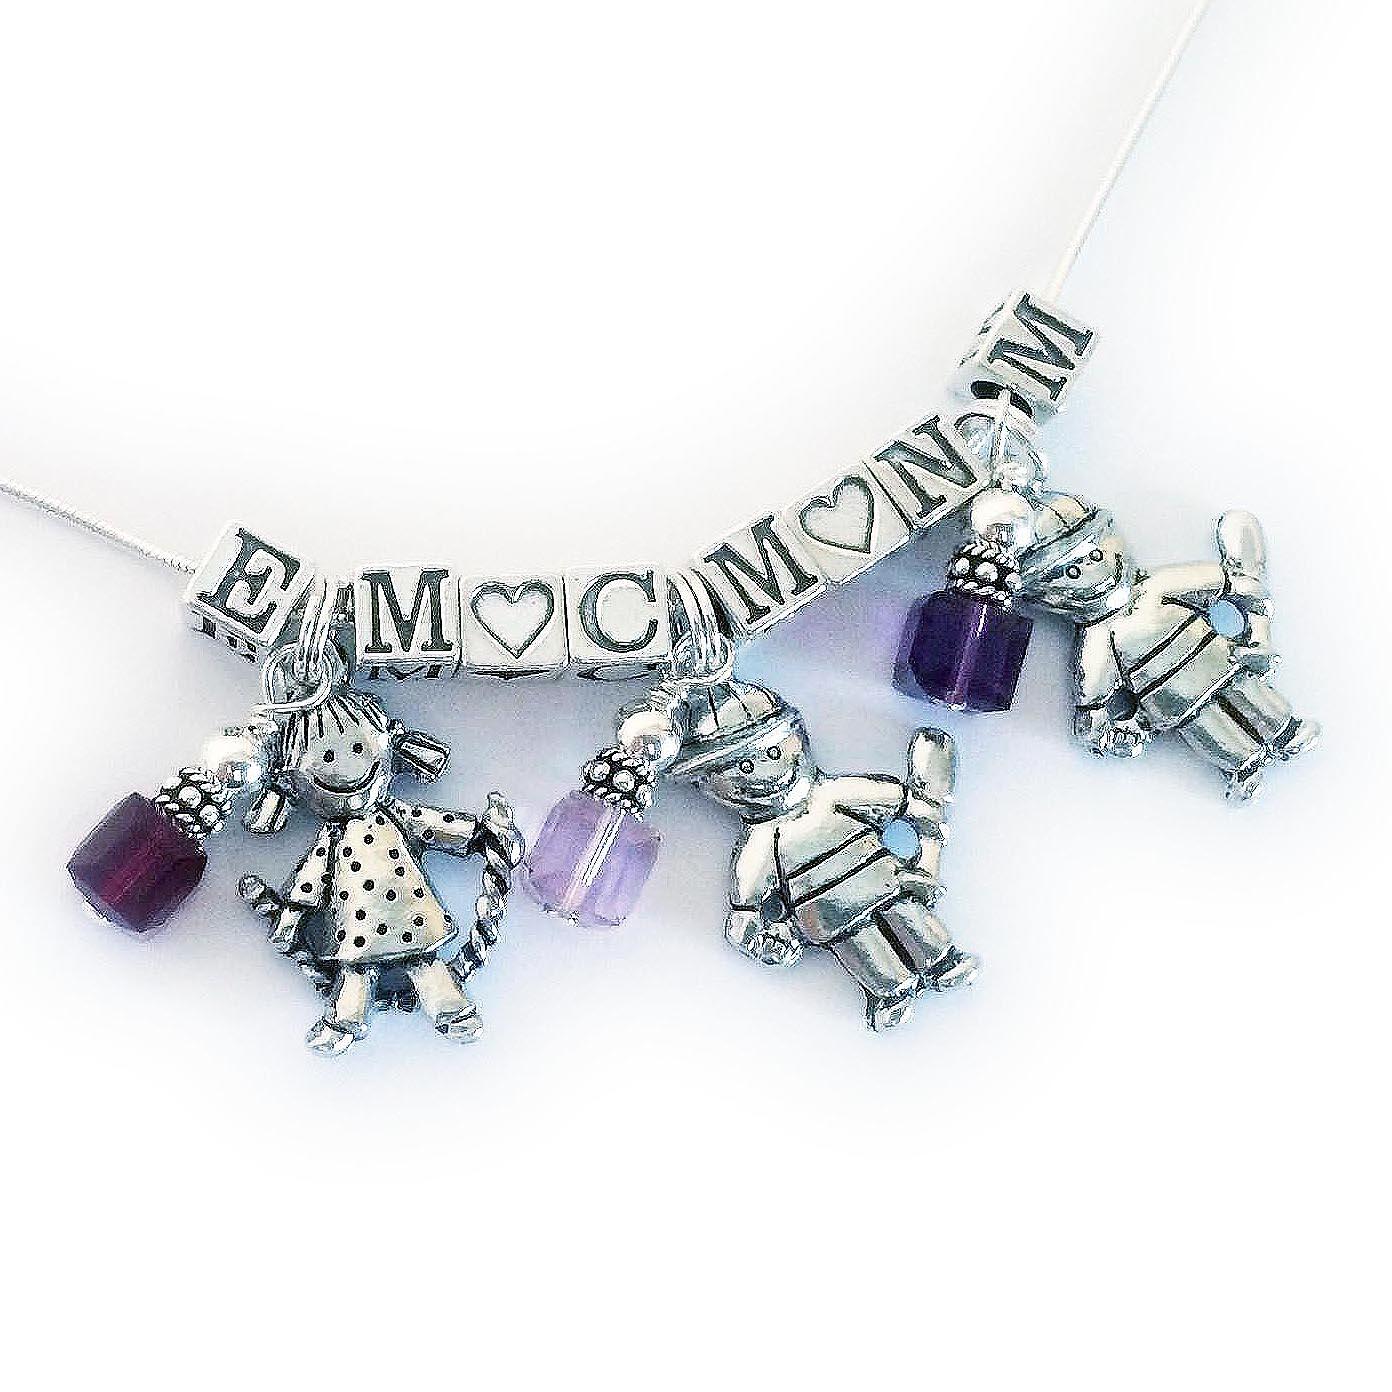 Boy Charm Necklace - JBL-CC-N1-2 boys charm and 1 girl charm